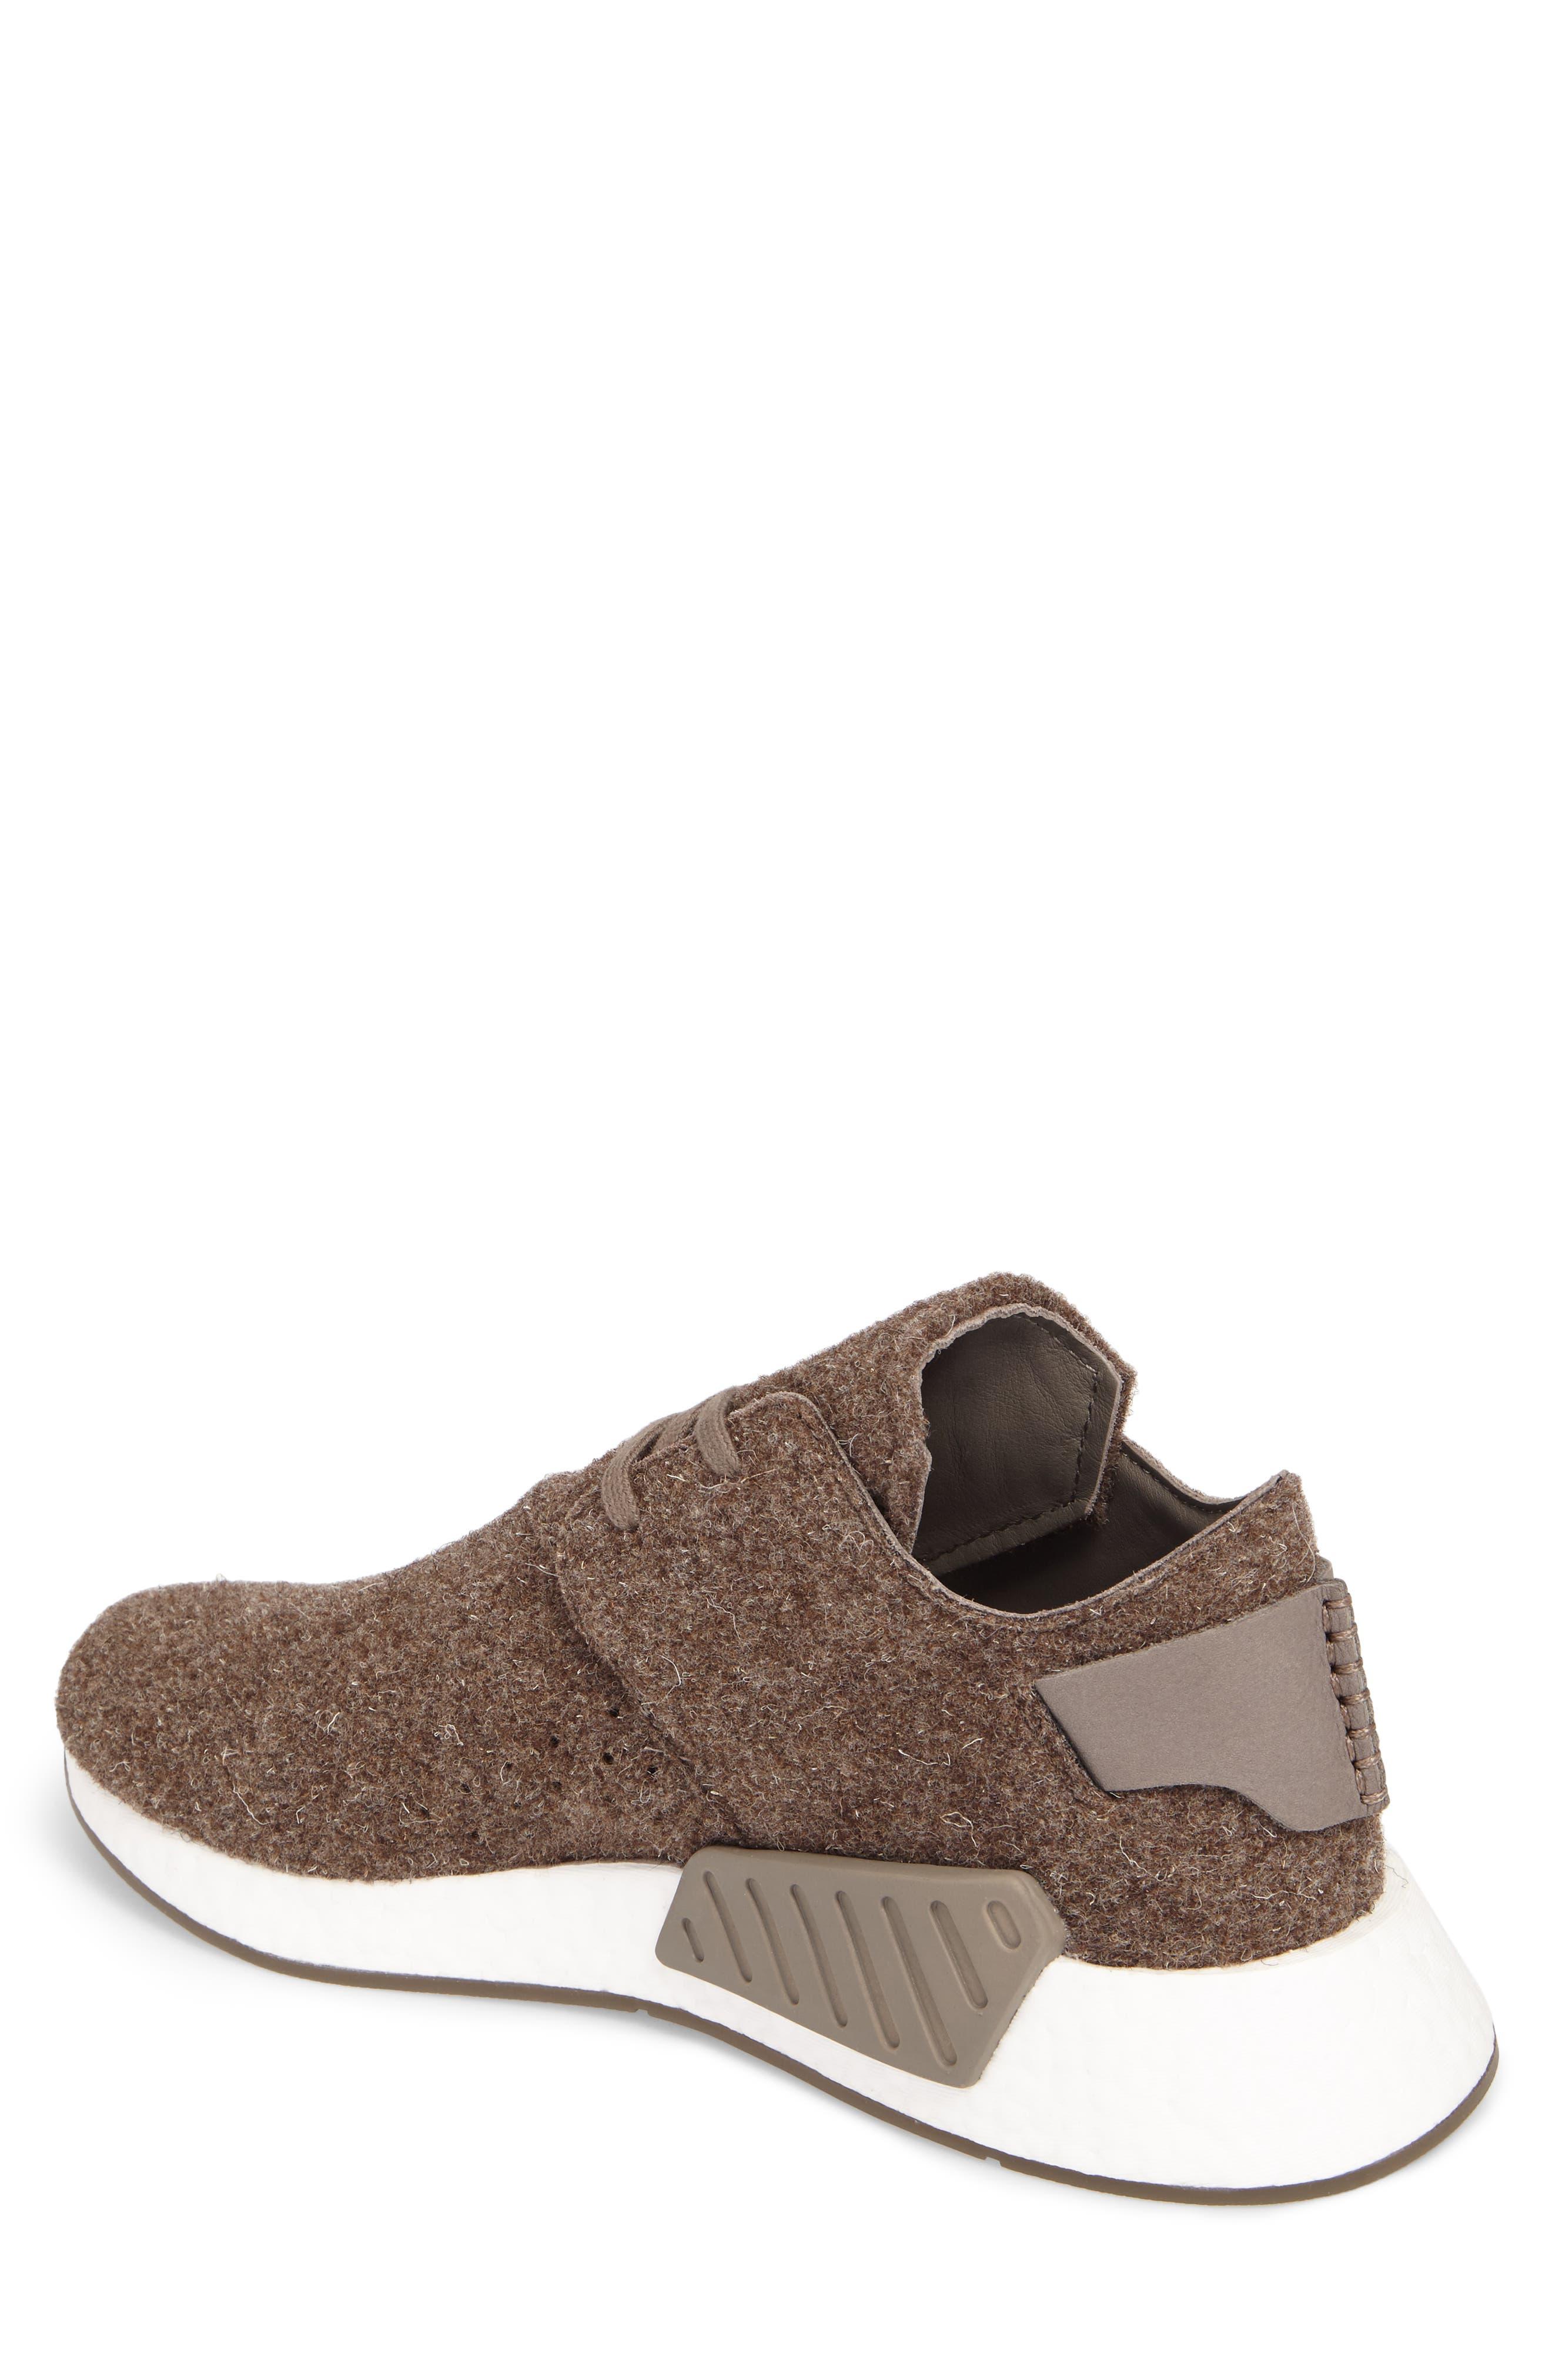 NMD C2 Sneaker (Men0,                             Alternate thumbnail 2, color,